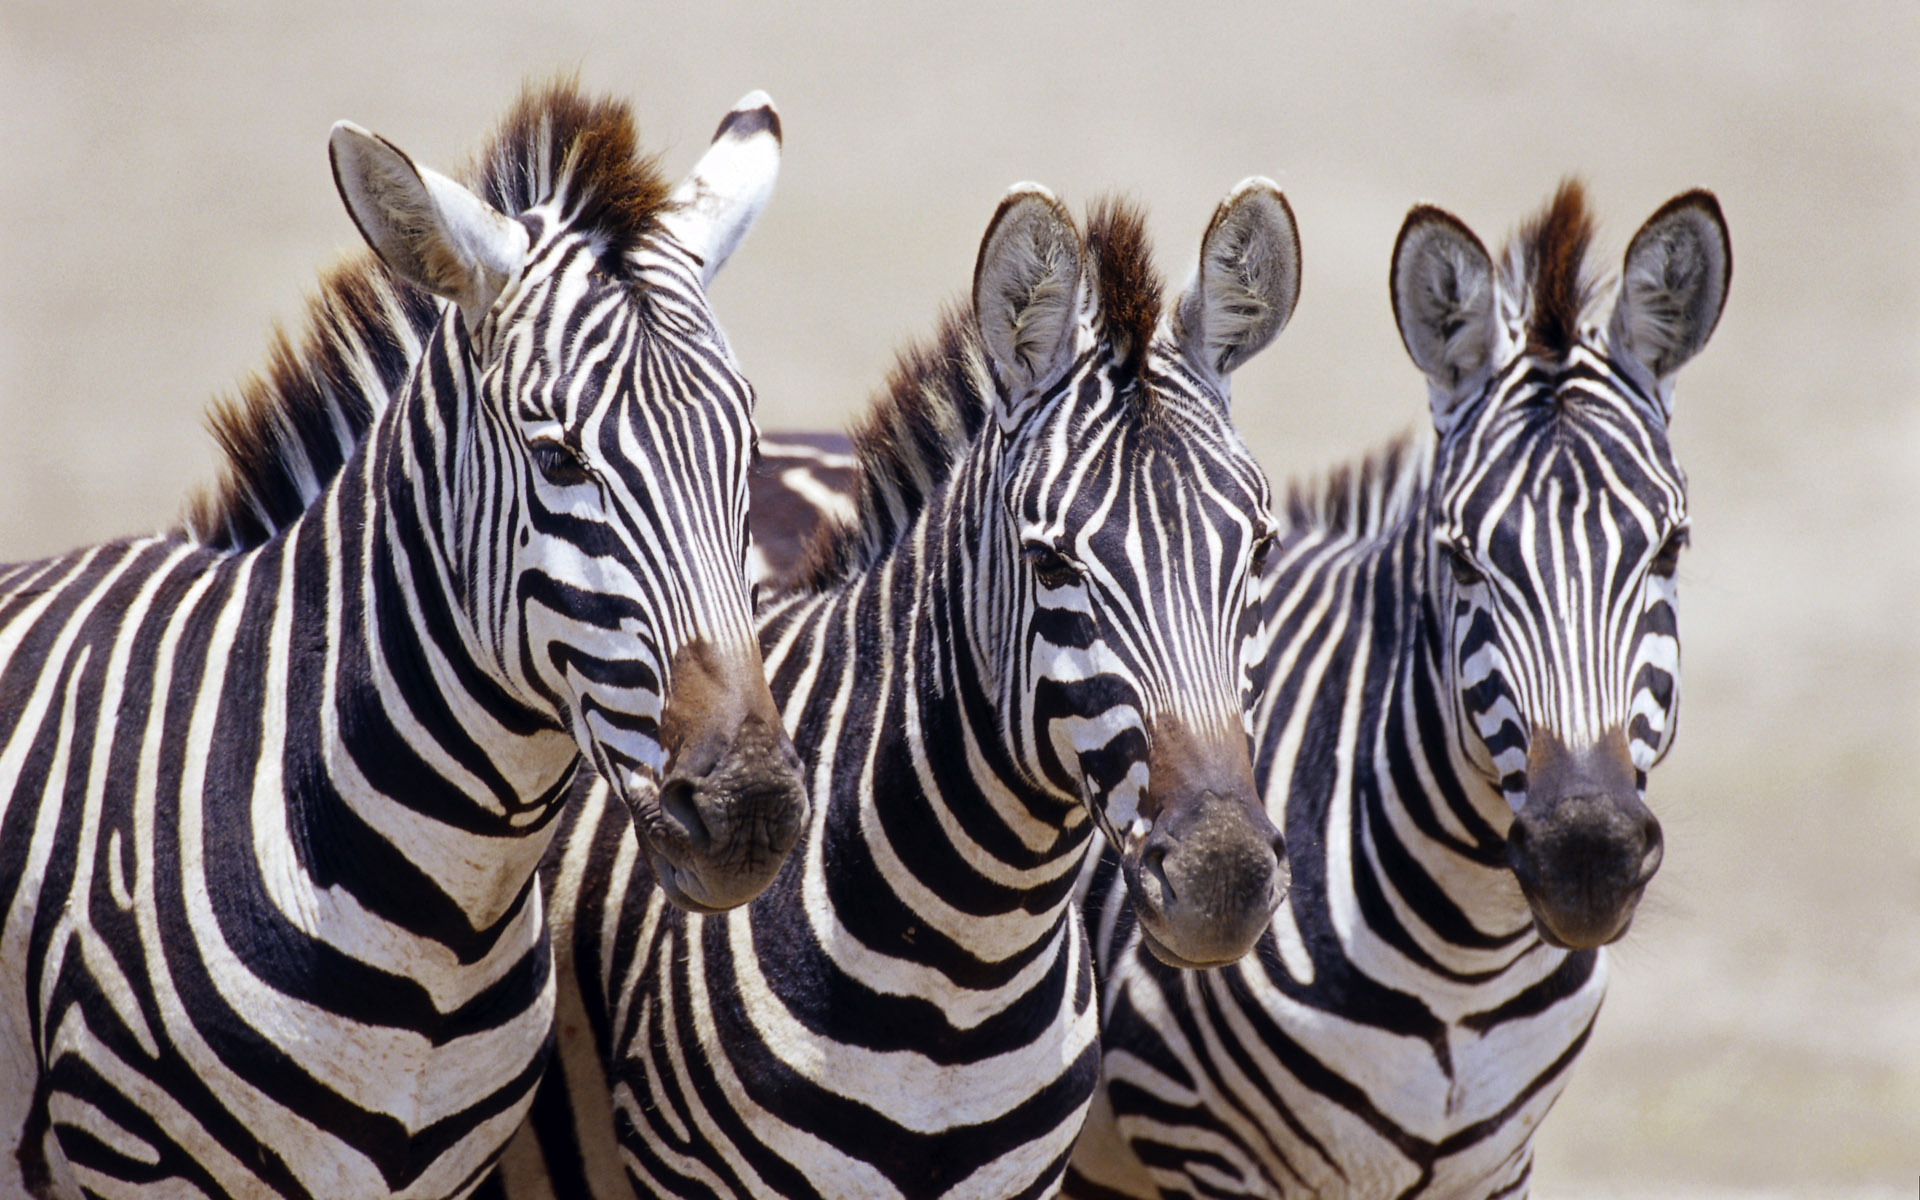 Zebra High Definition Wallpapers